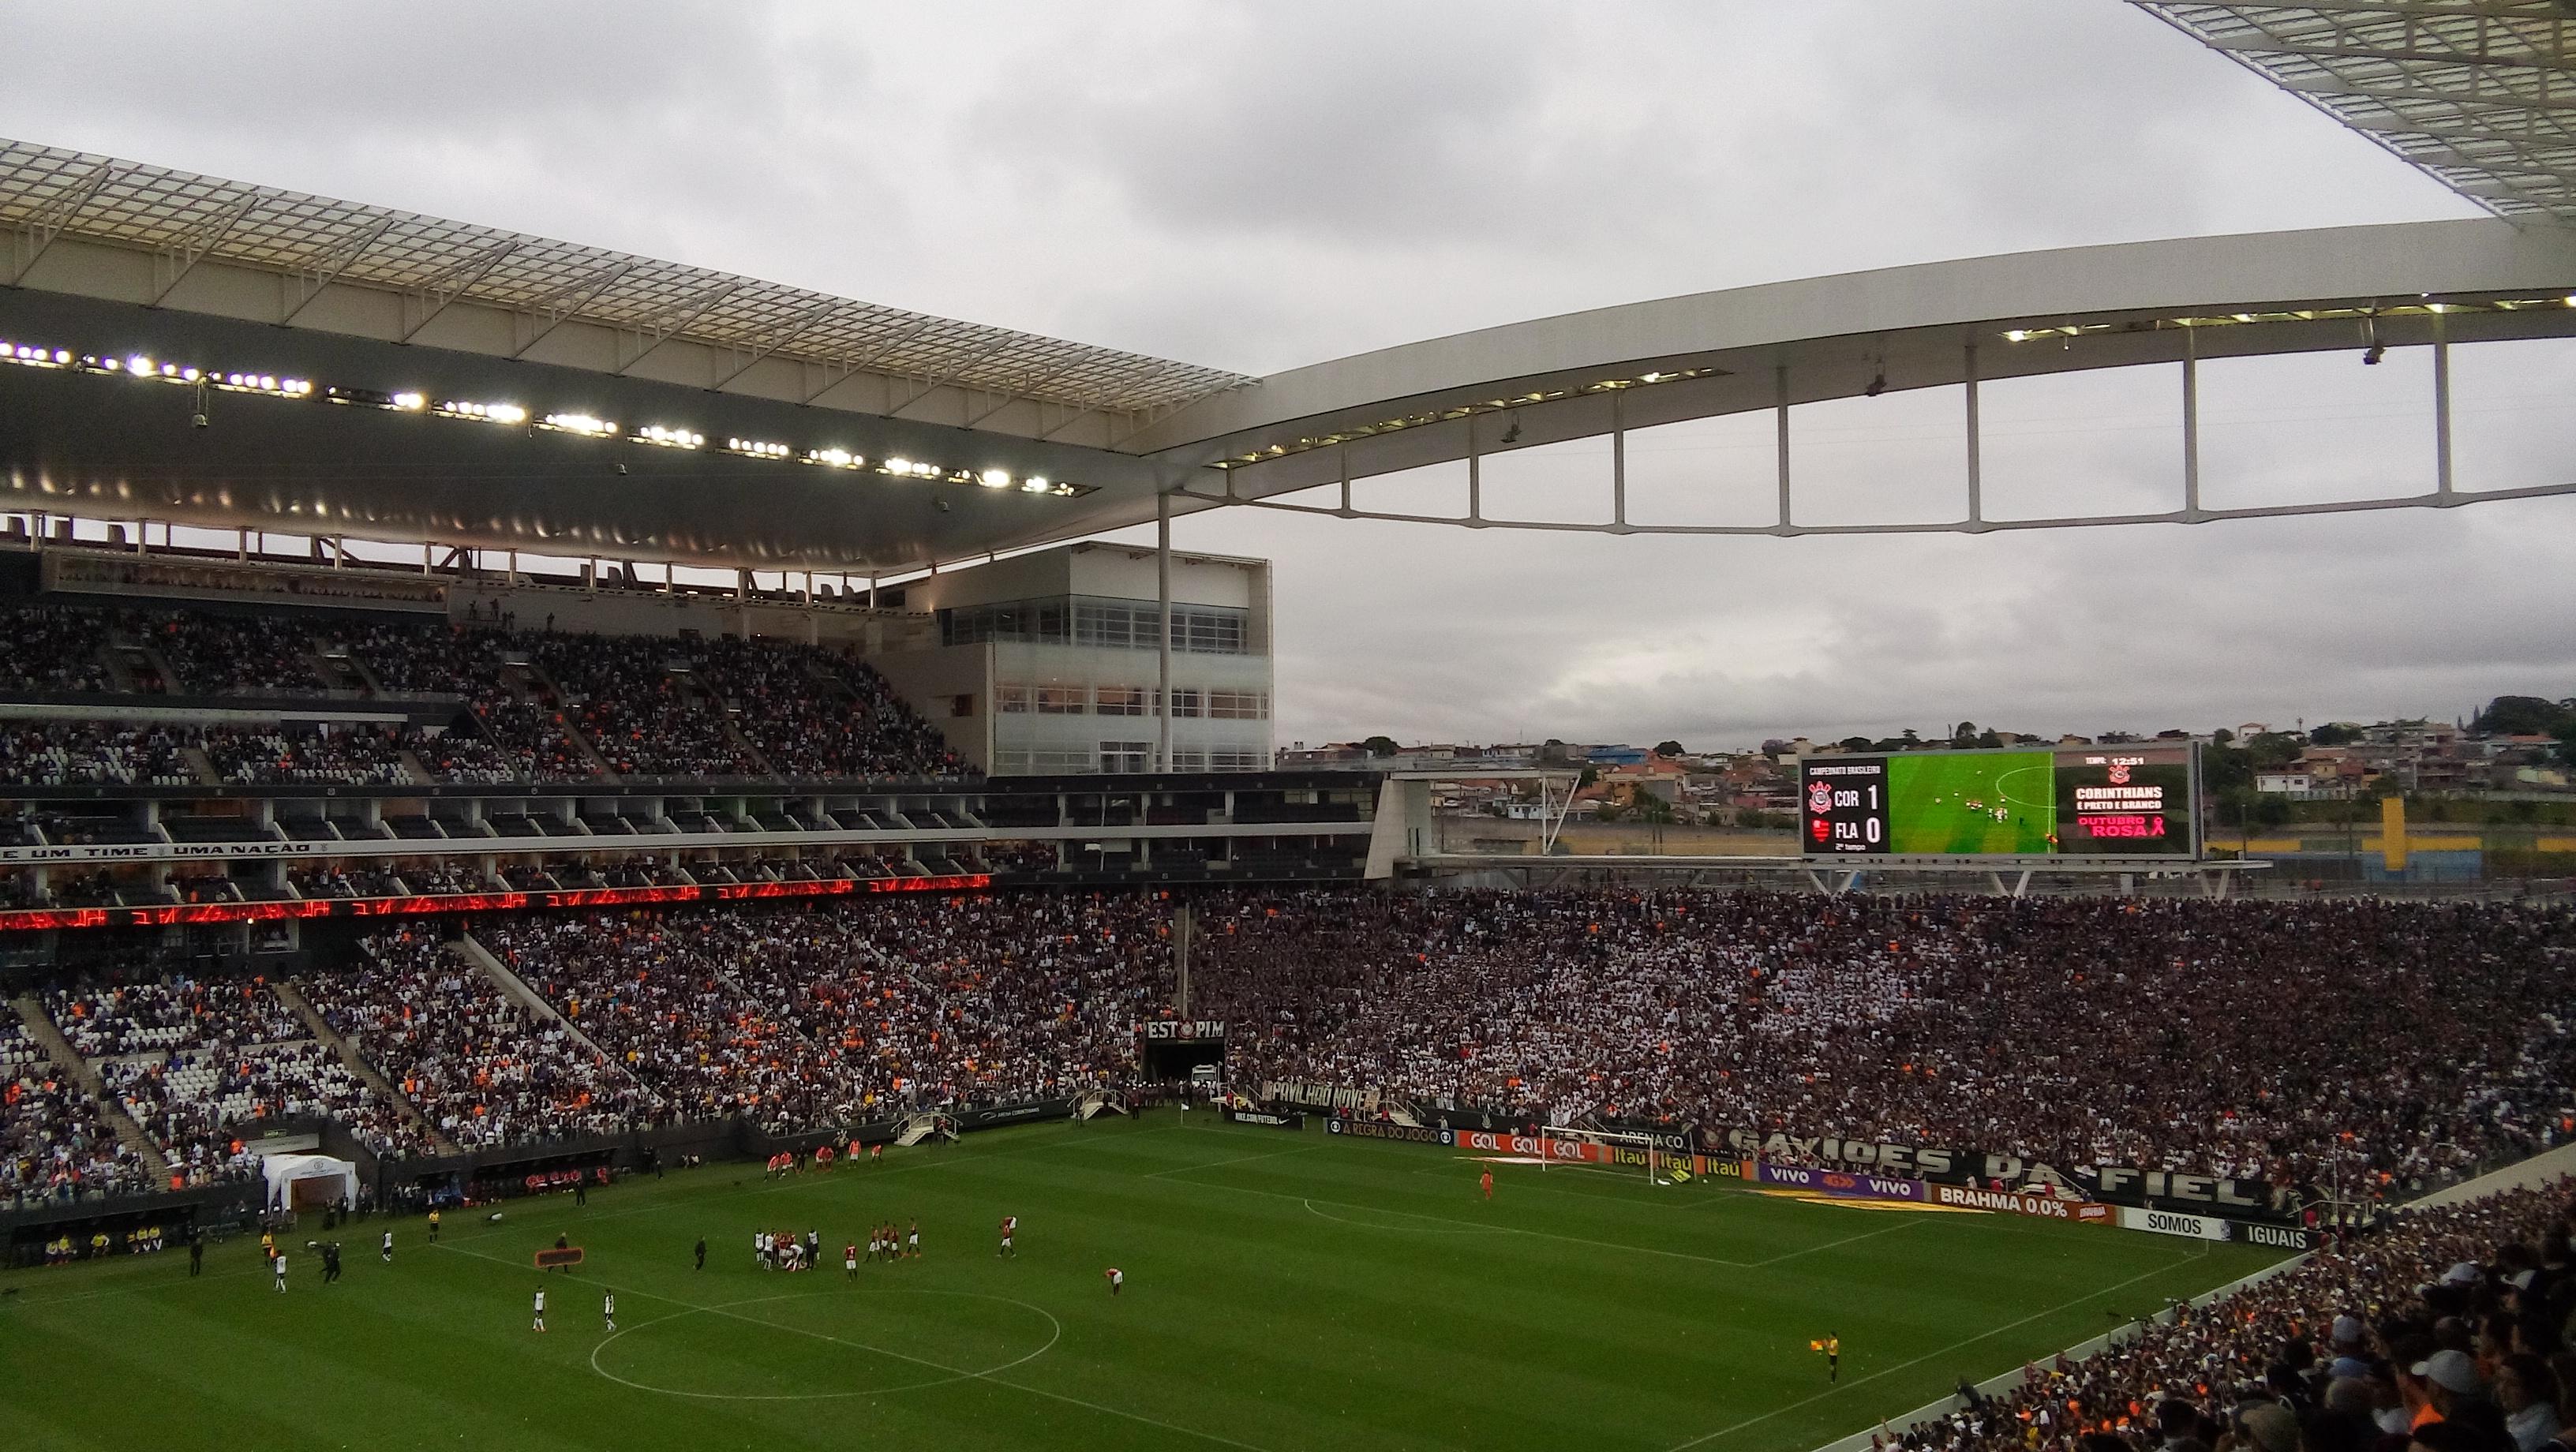 e2494233d5 Corinthians x Flamengo na Arena Corinthians.